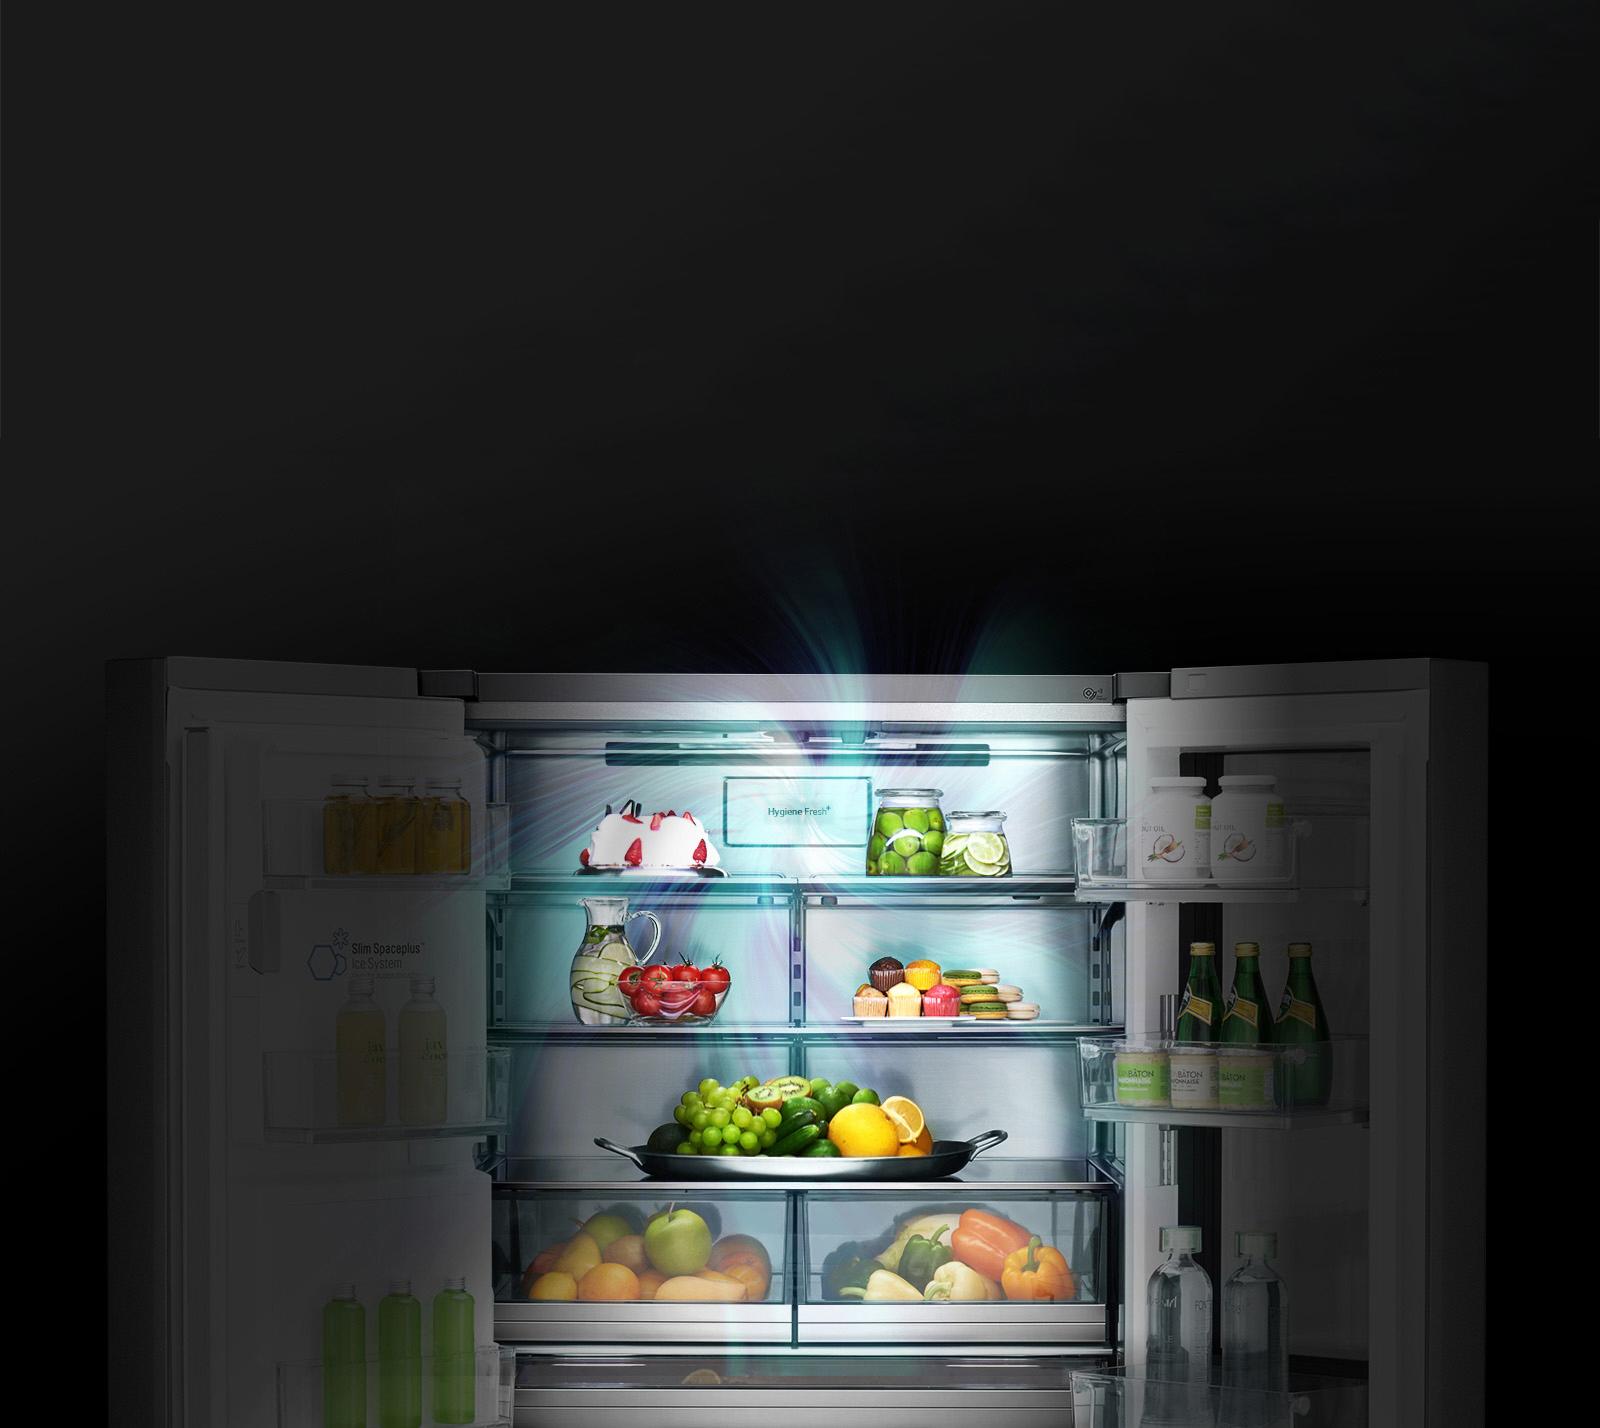 قیمت یخچال سایدX33 ال جی